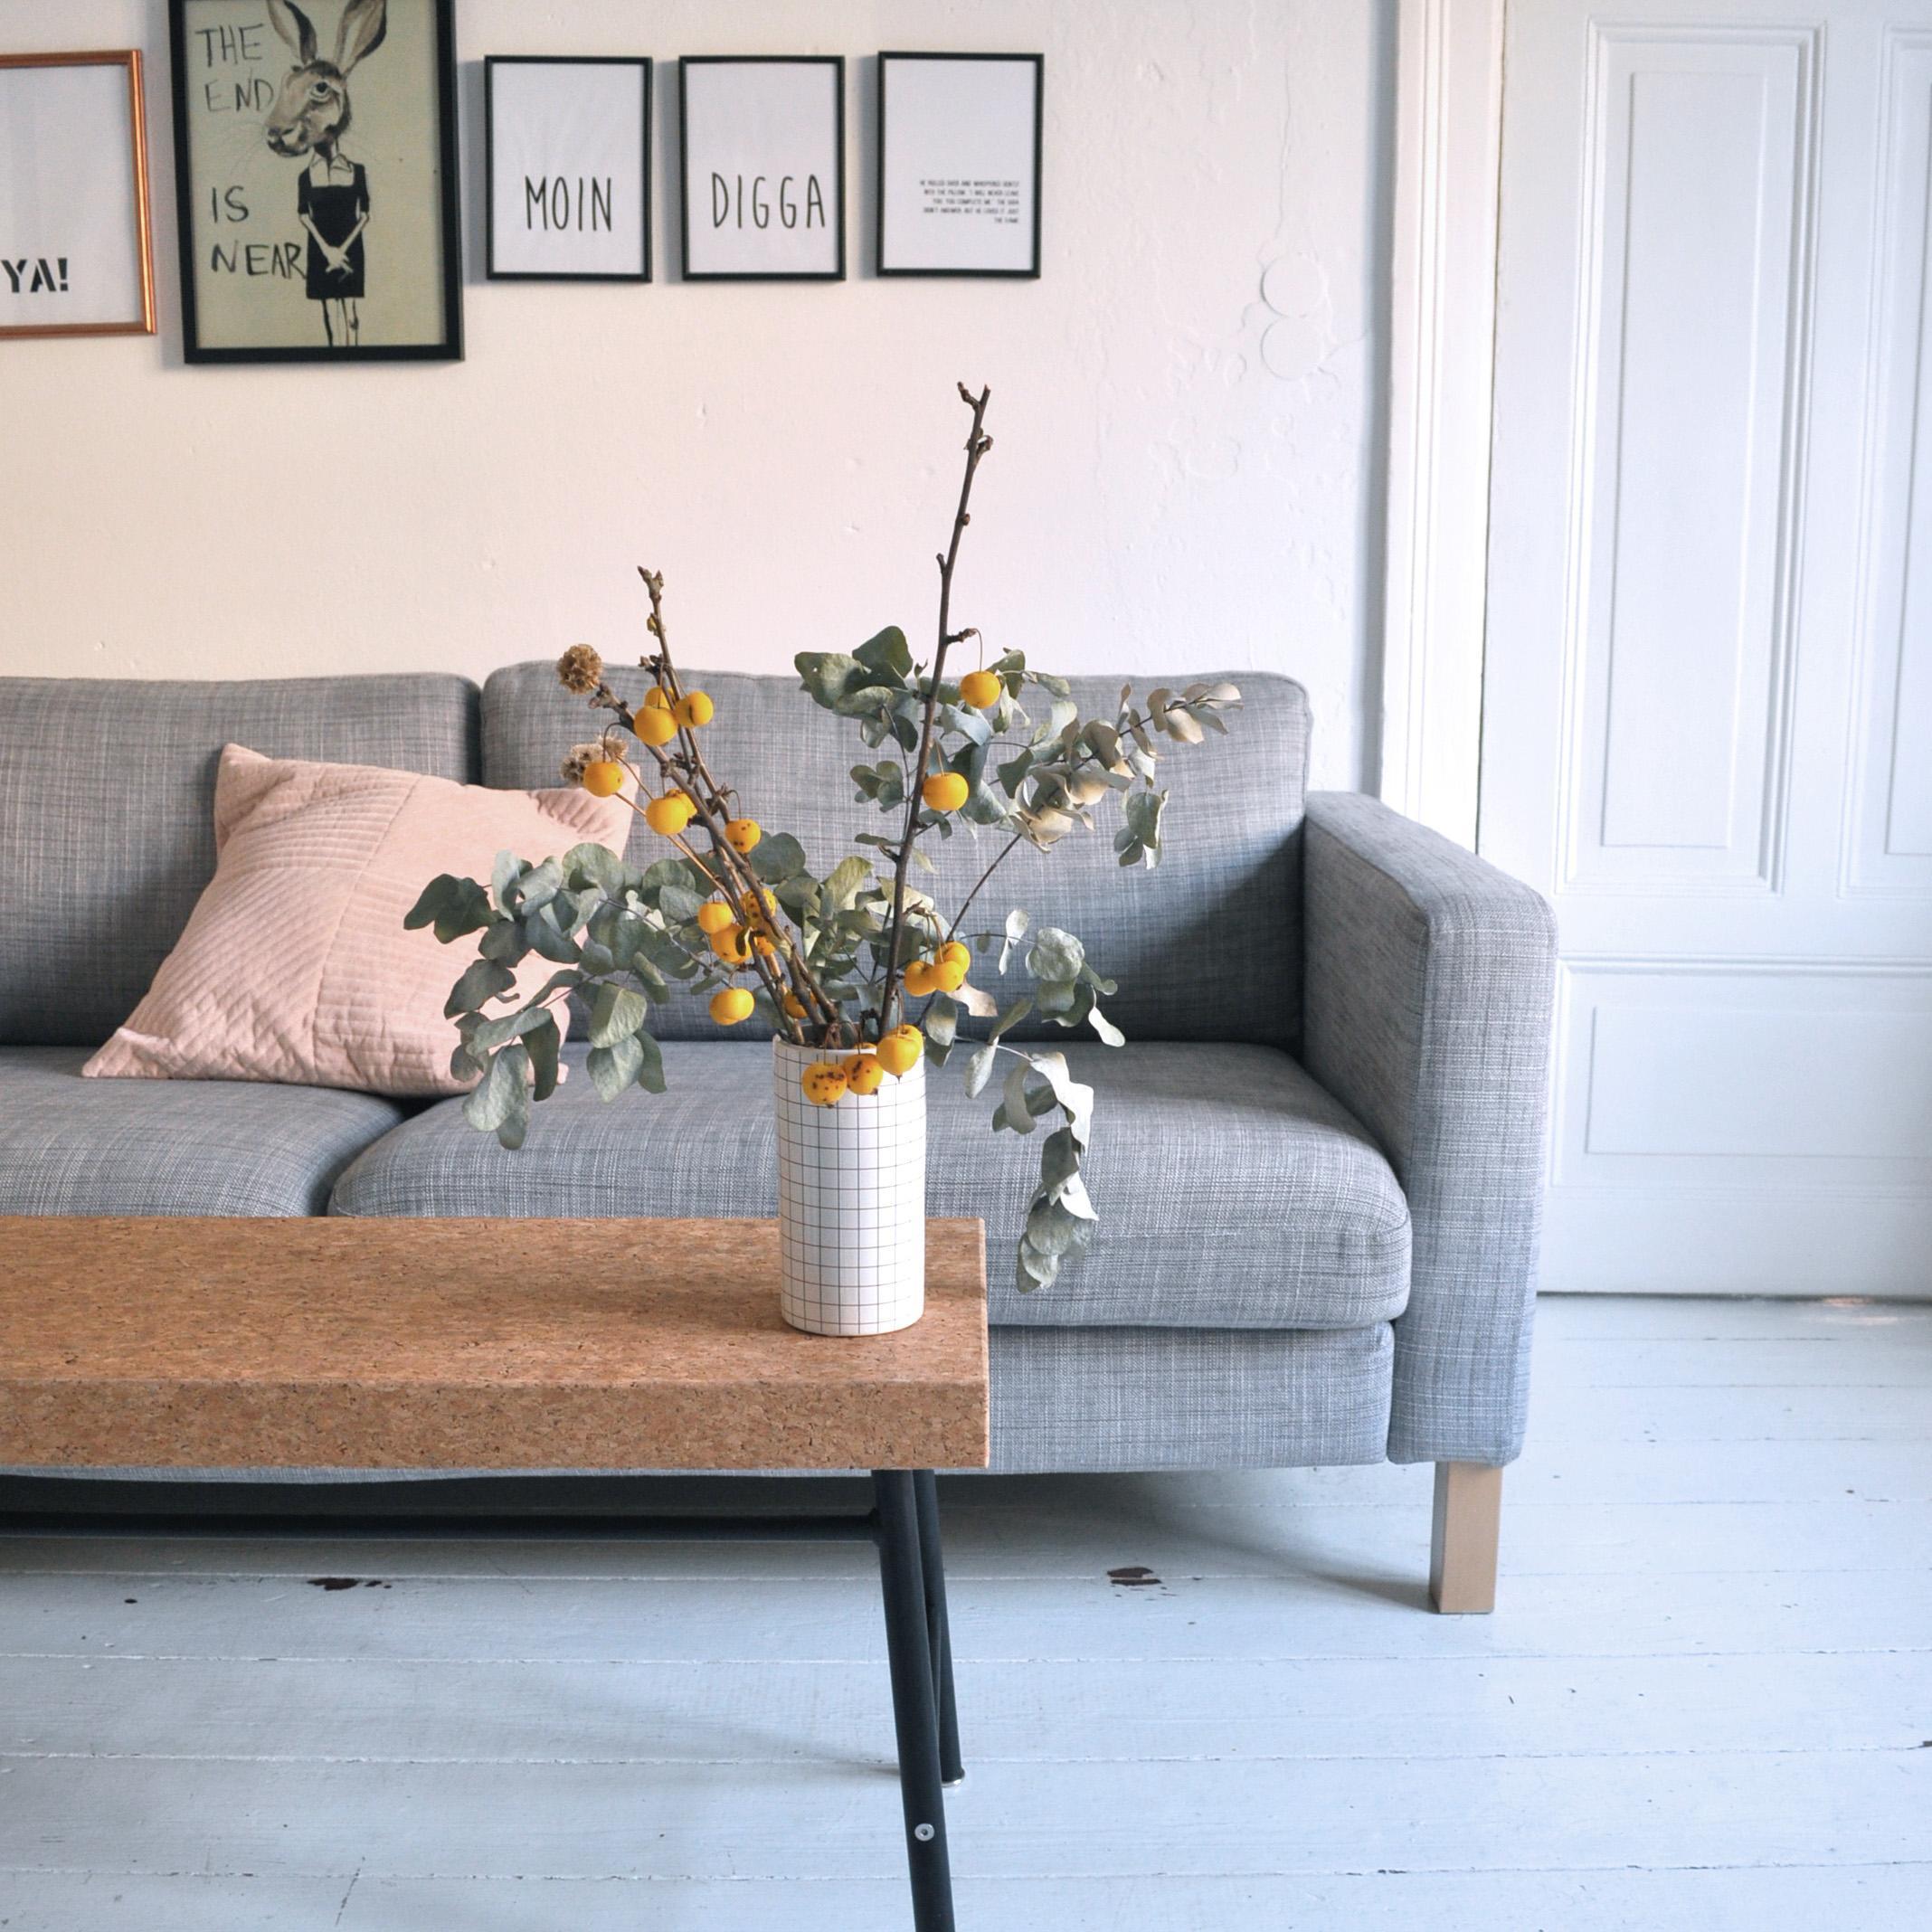 couchtisch • bilder & ideen • couchstyle, Hause deko